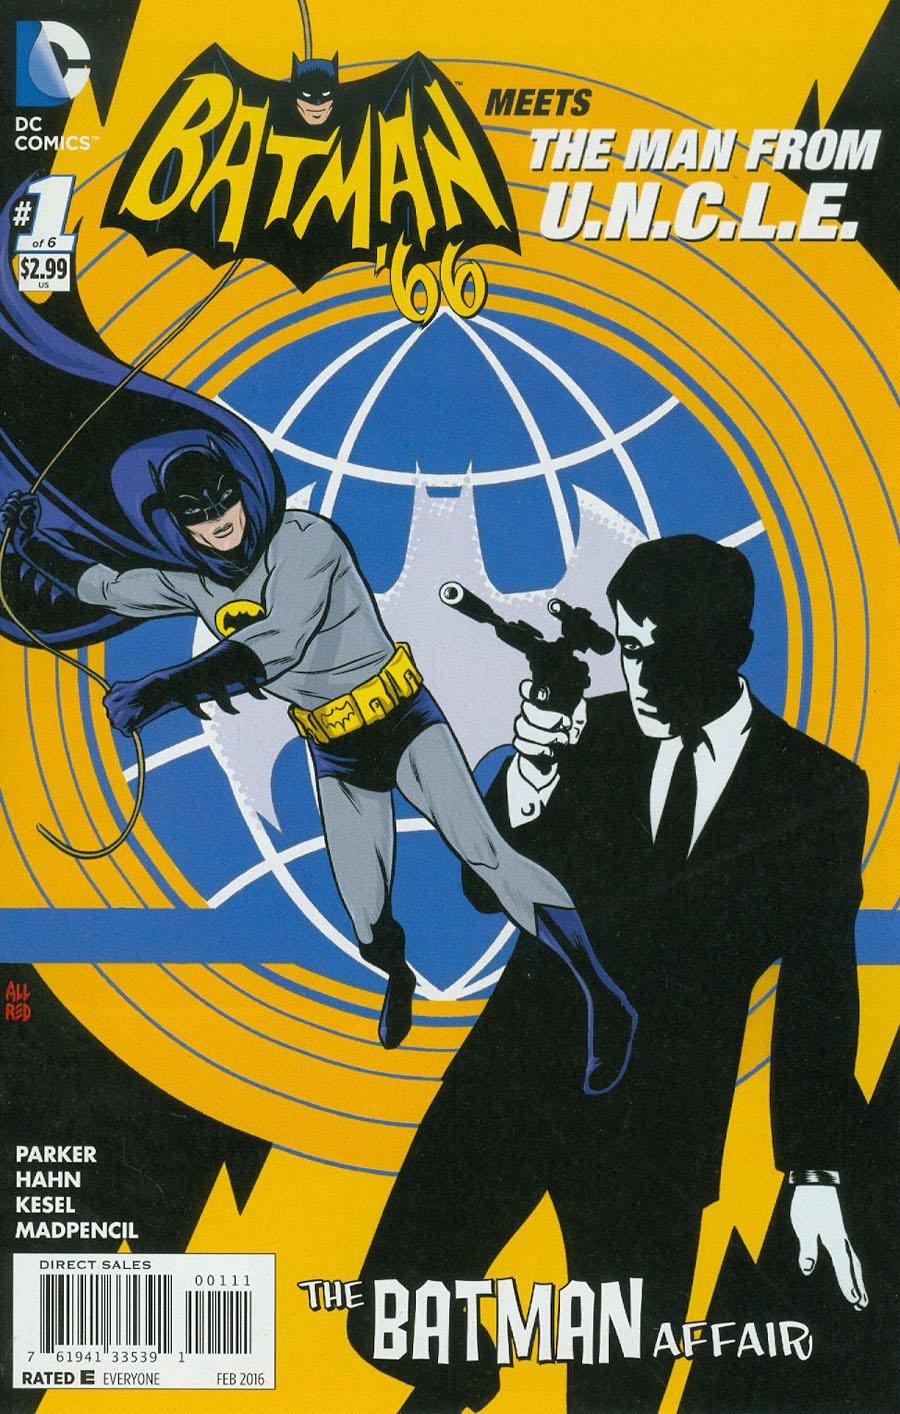 Batman 66 Meets The Man From U.N.C.L.E. #1 Cover A Regular Michael Allred Cover